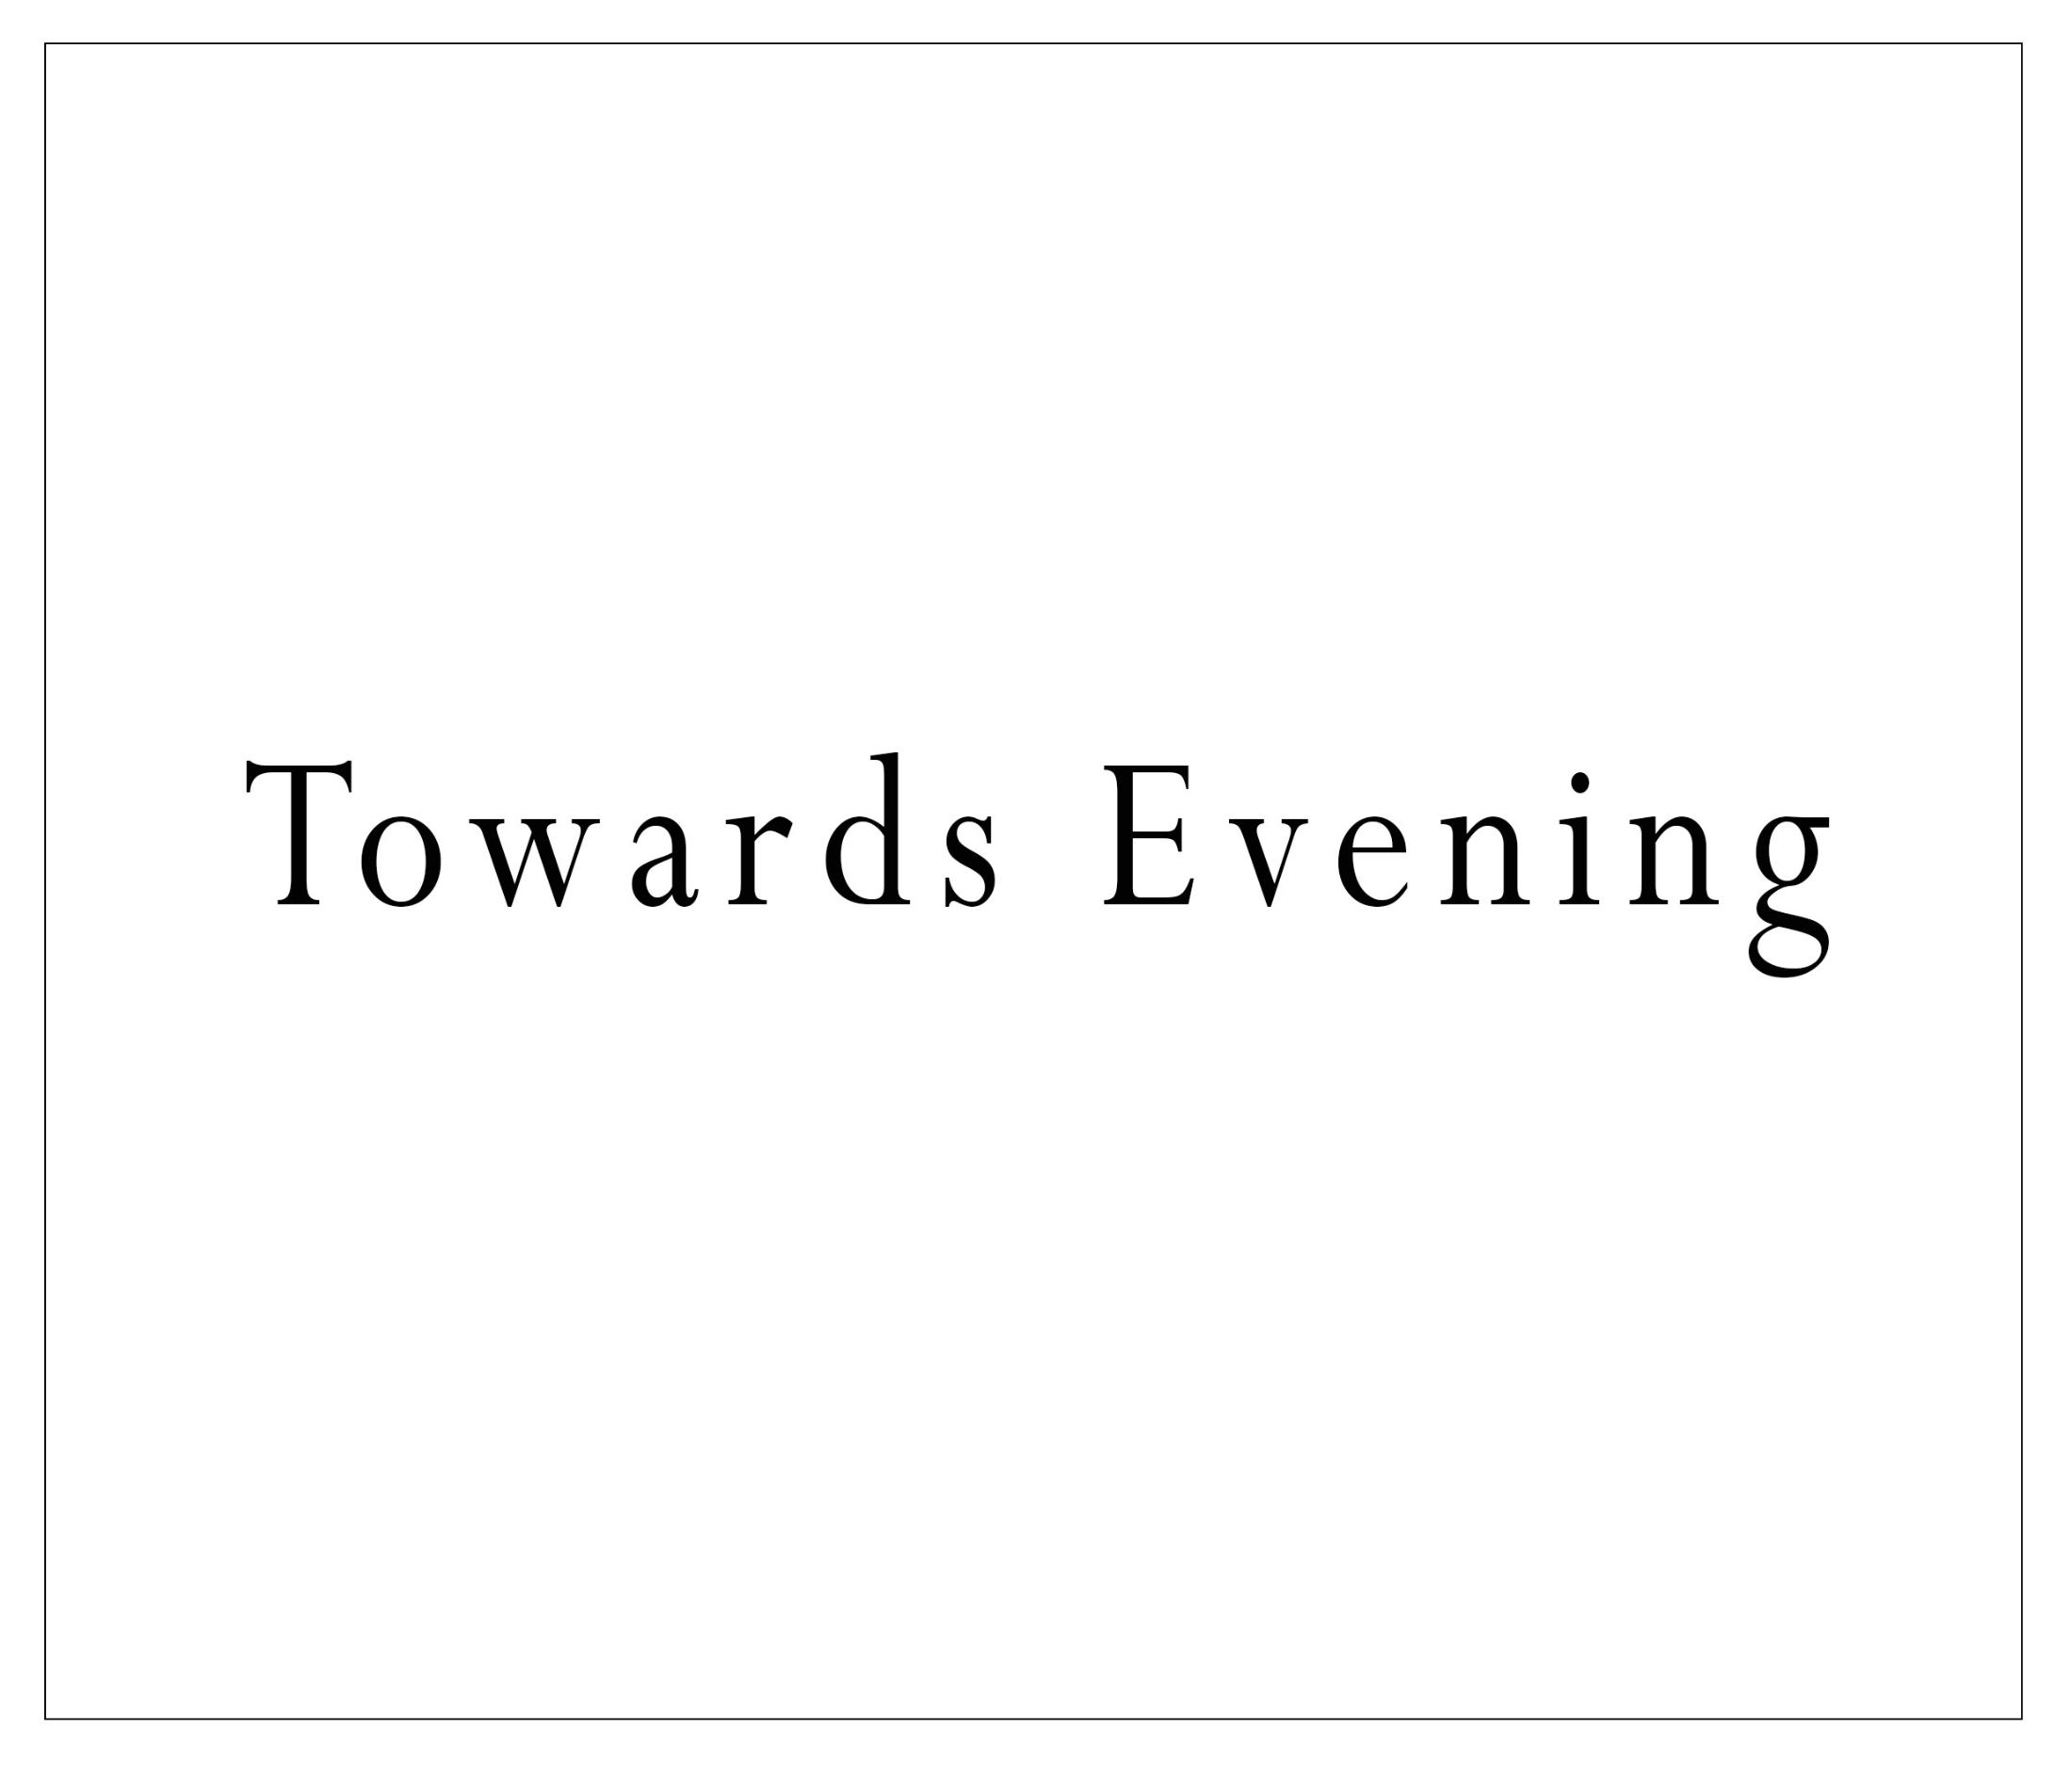 toward evening.jpg